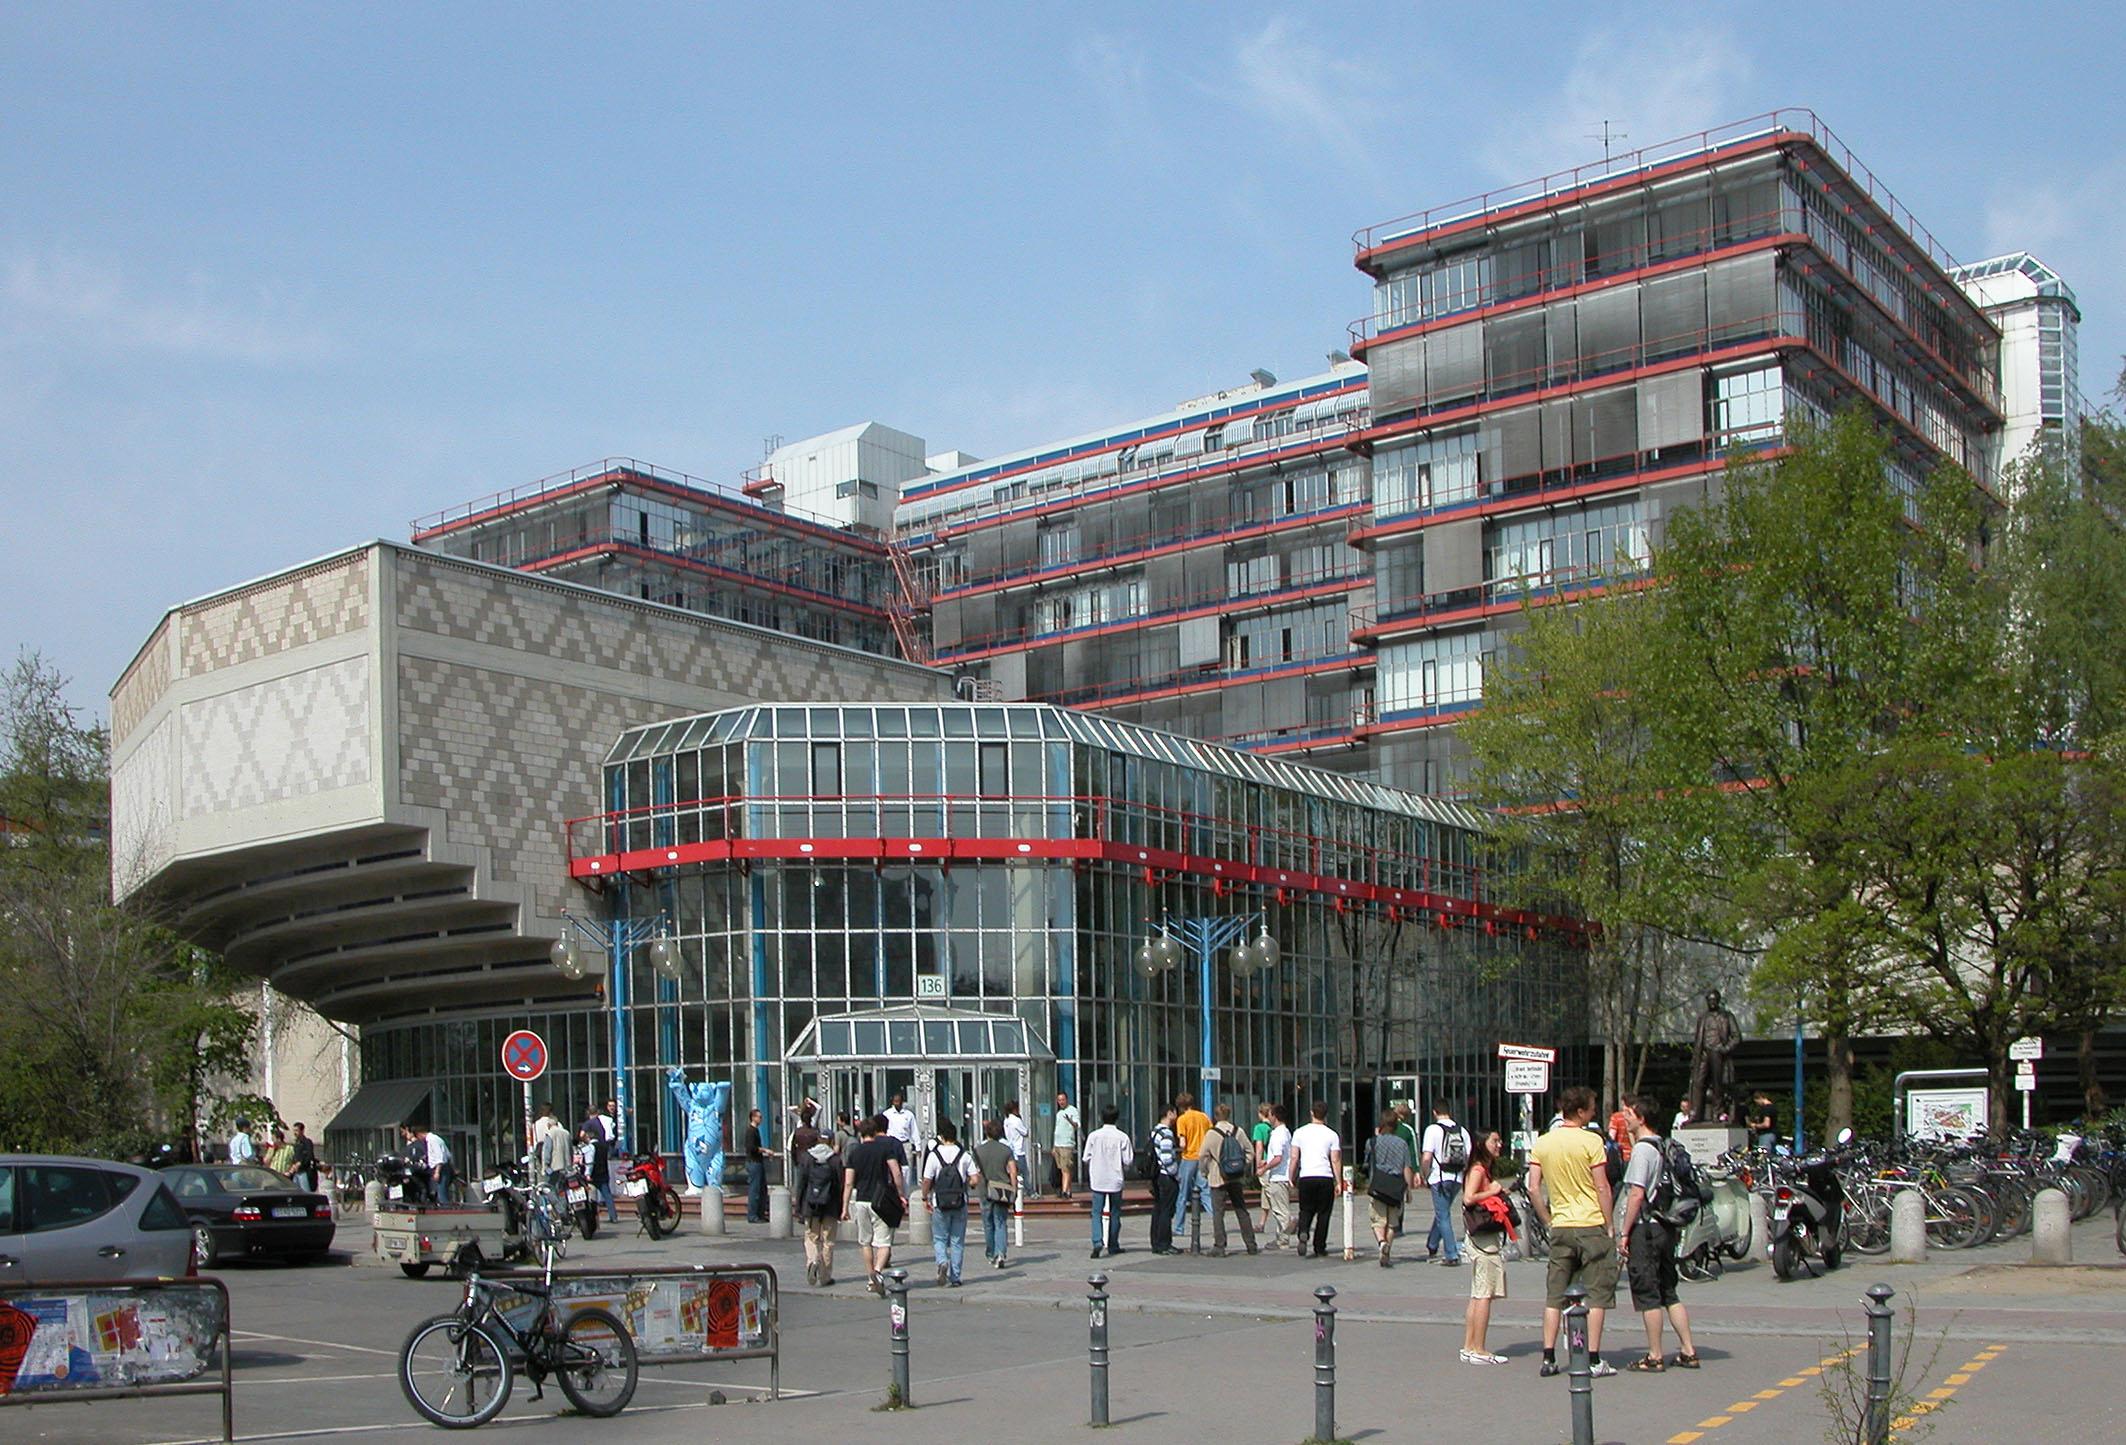 Tub Berlin